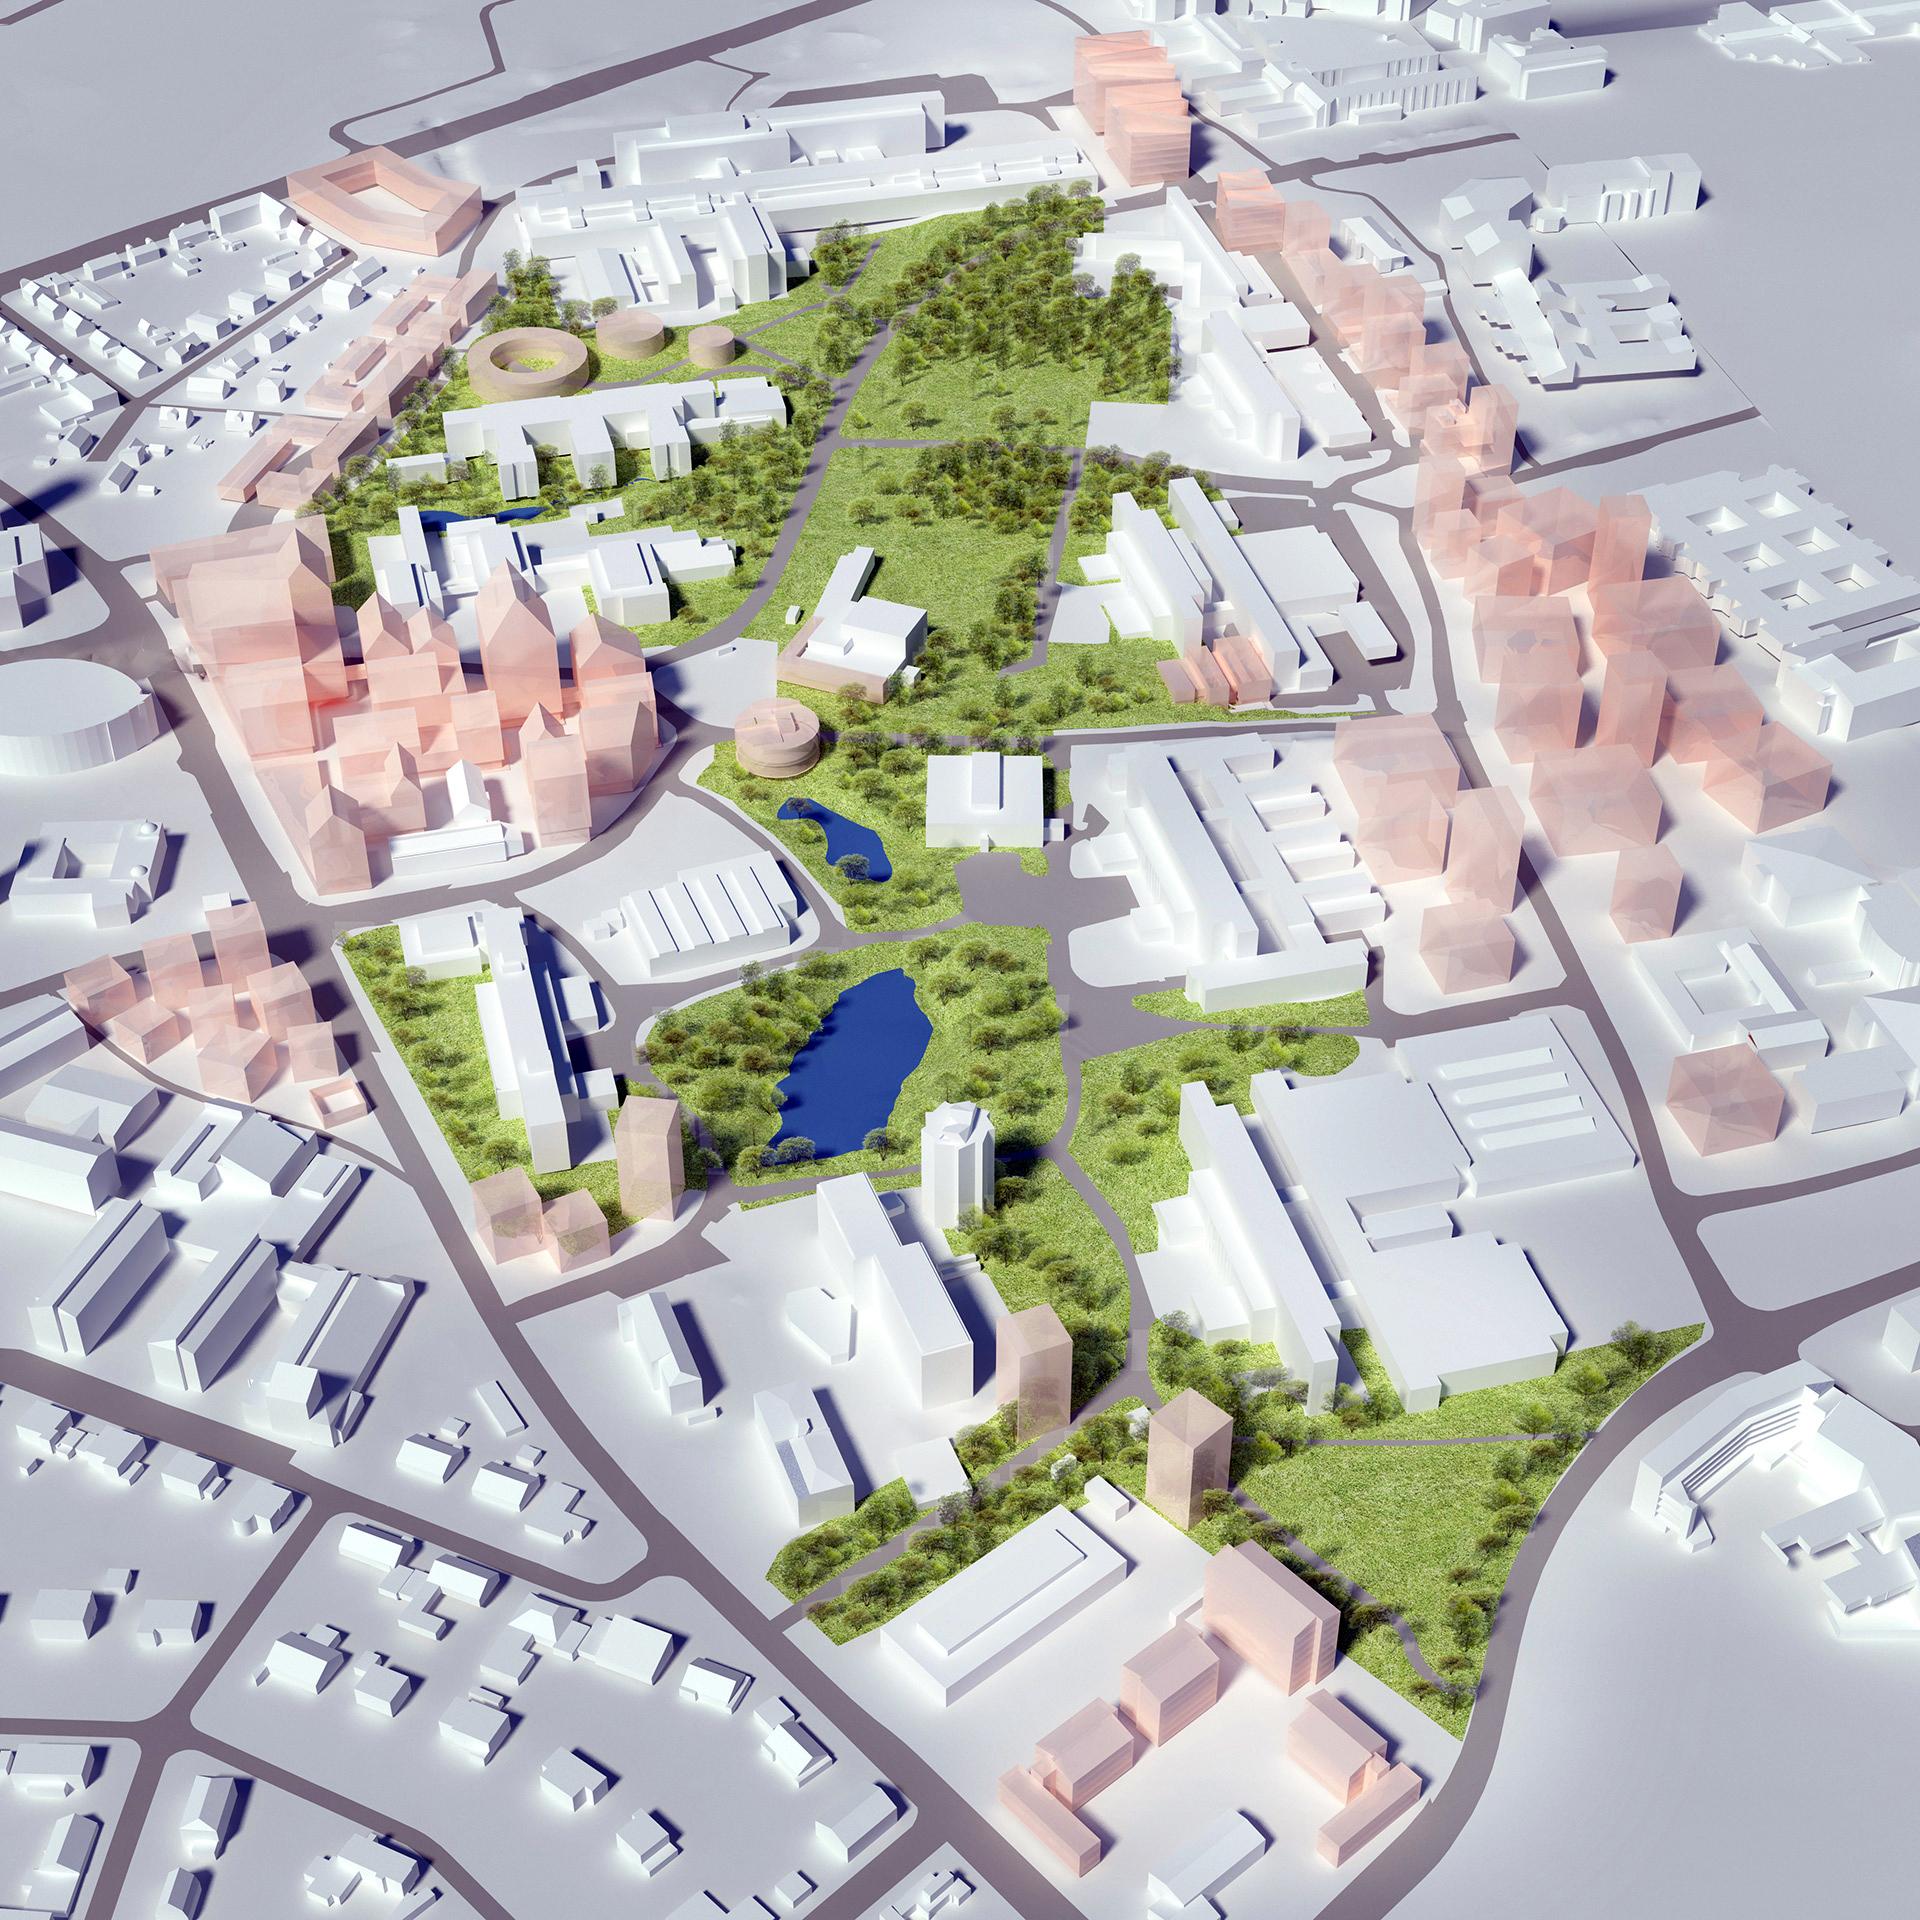 LTH utvecklingsplan, Lund